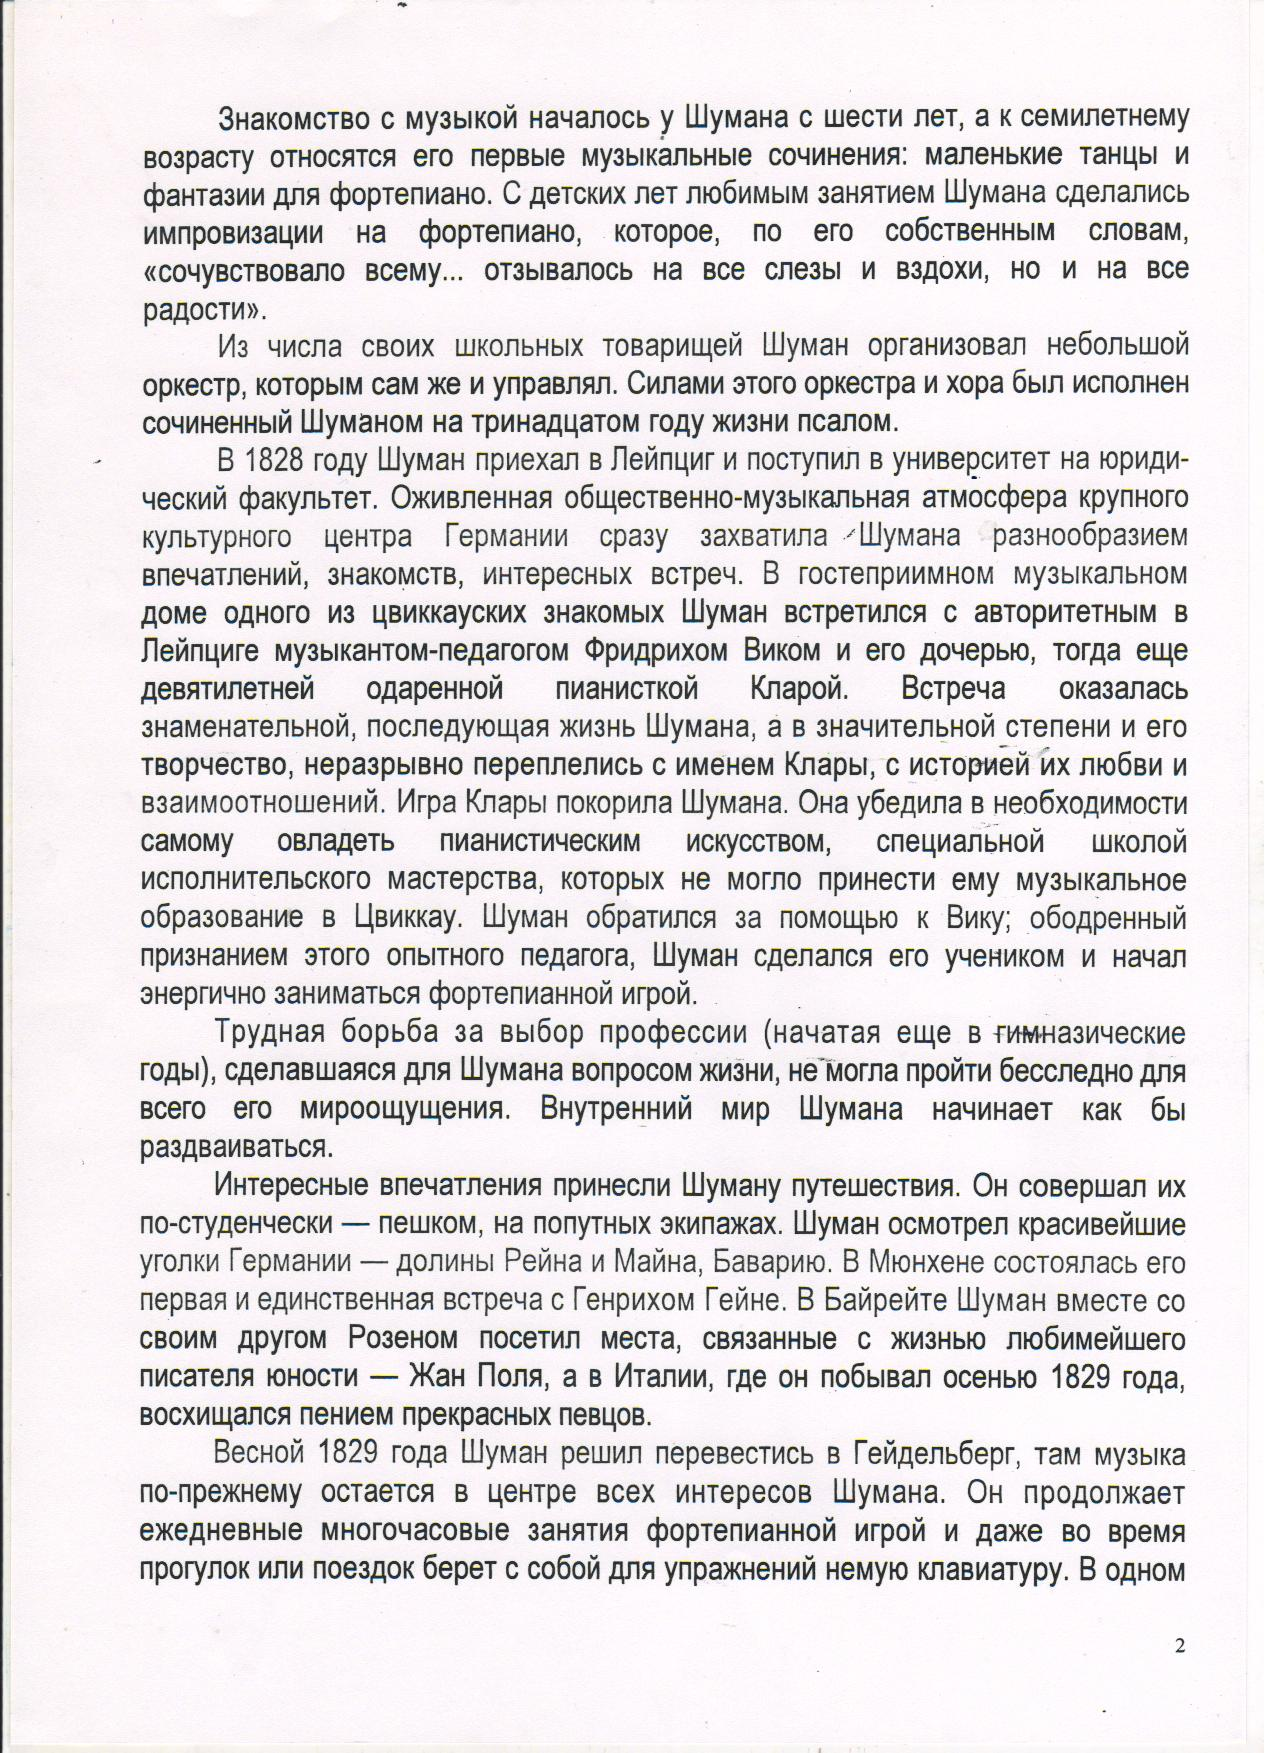 C:\Documents and Settings\Учитель\Рабочий стол\Шуман 2.jpg